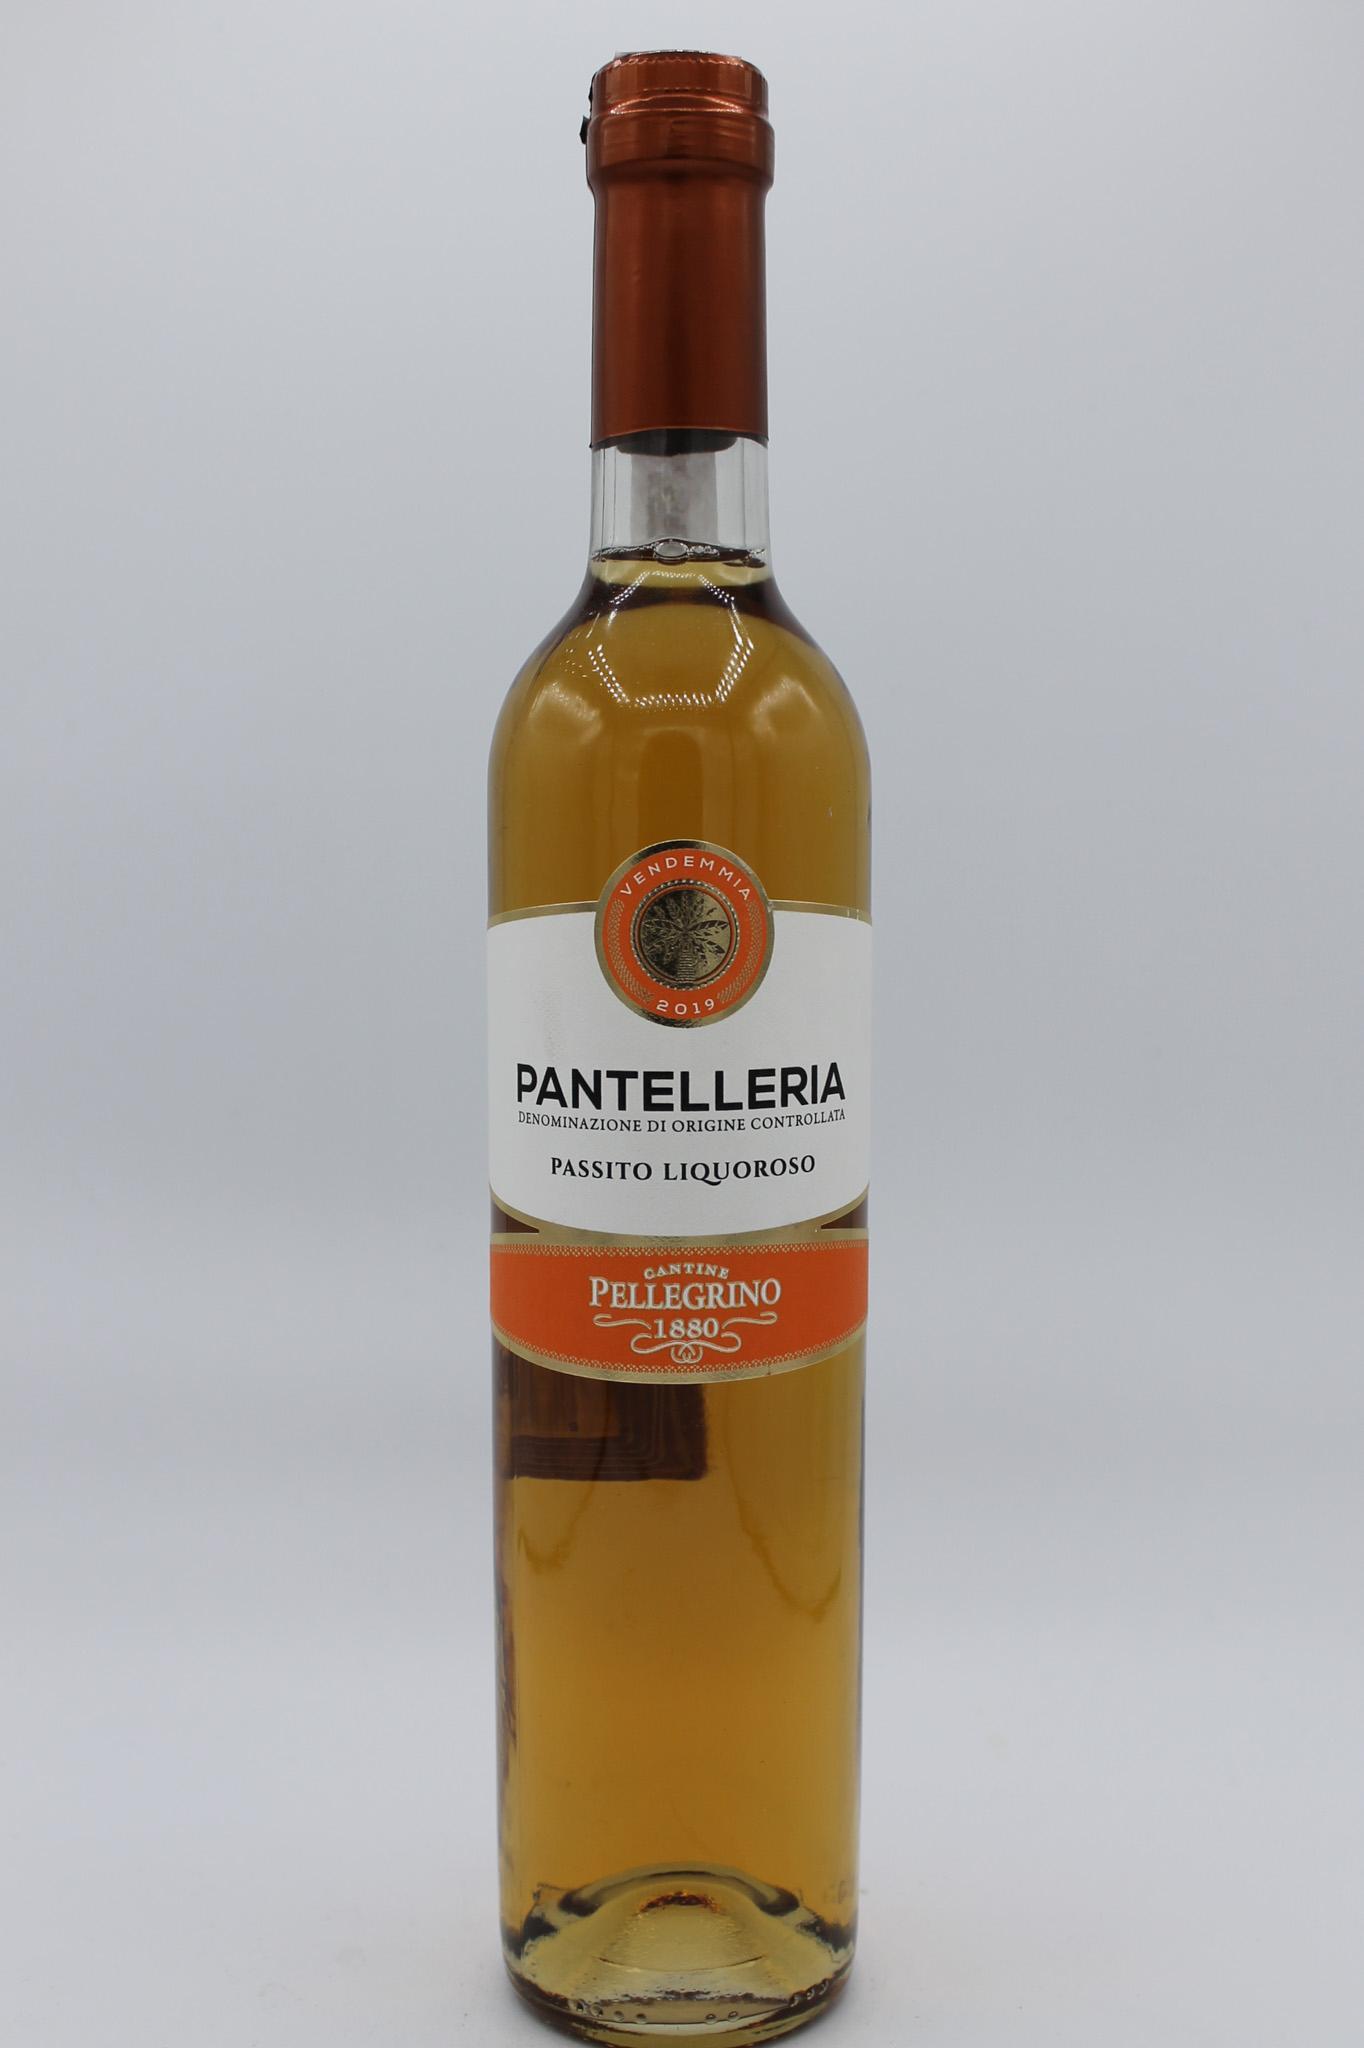 Pellegrino passito di pantelleria DOC 500ml.